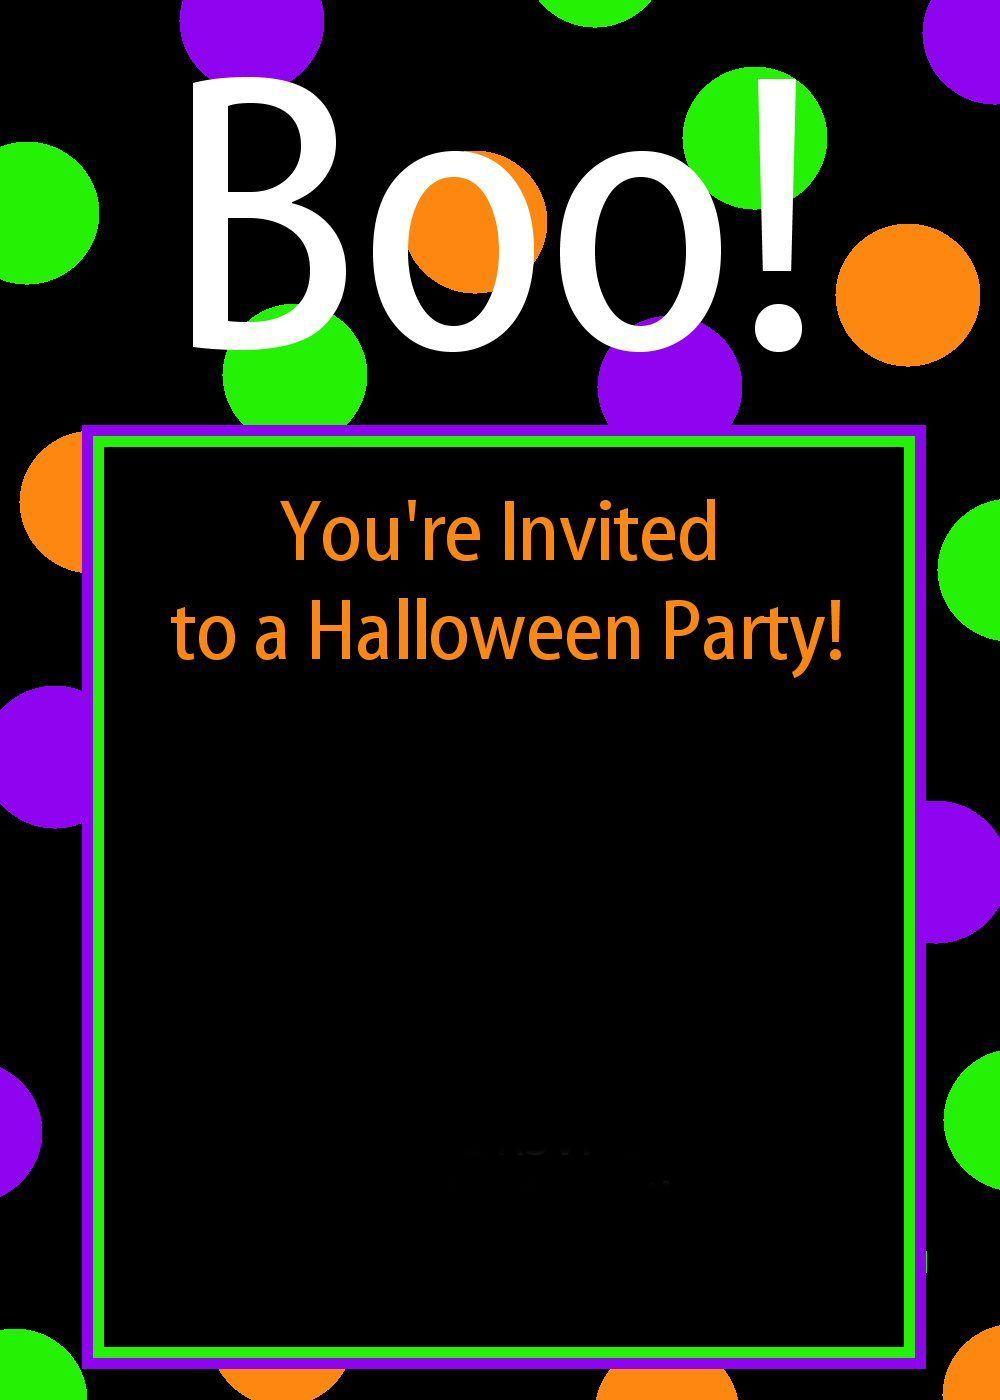 Cute Free Printable Halloween Invitations Fun Squared Halloween Birthday Party Invitations Kids Halloween Party Invitations Halloween Party Invitation Template